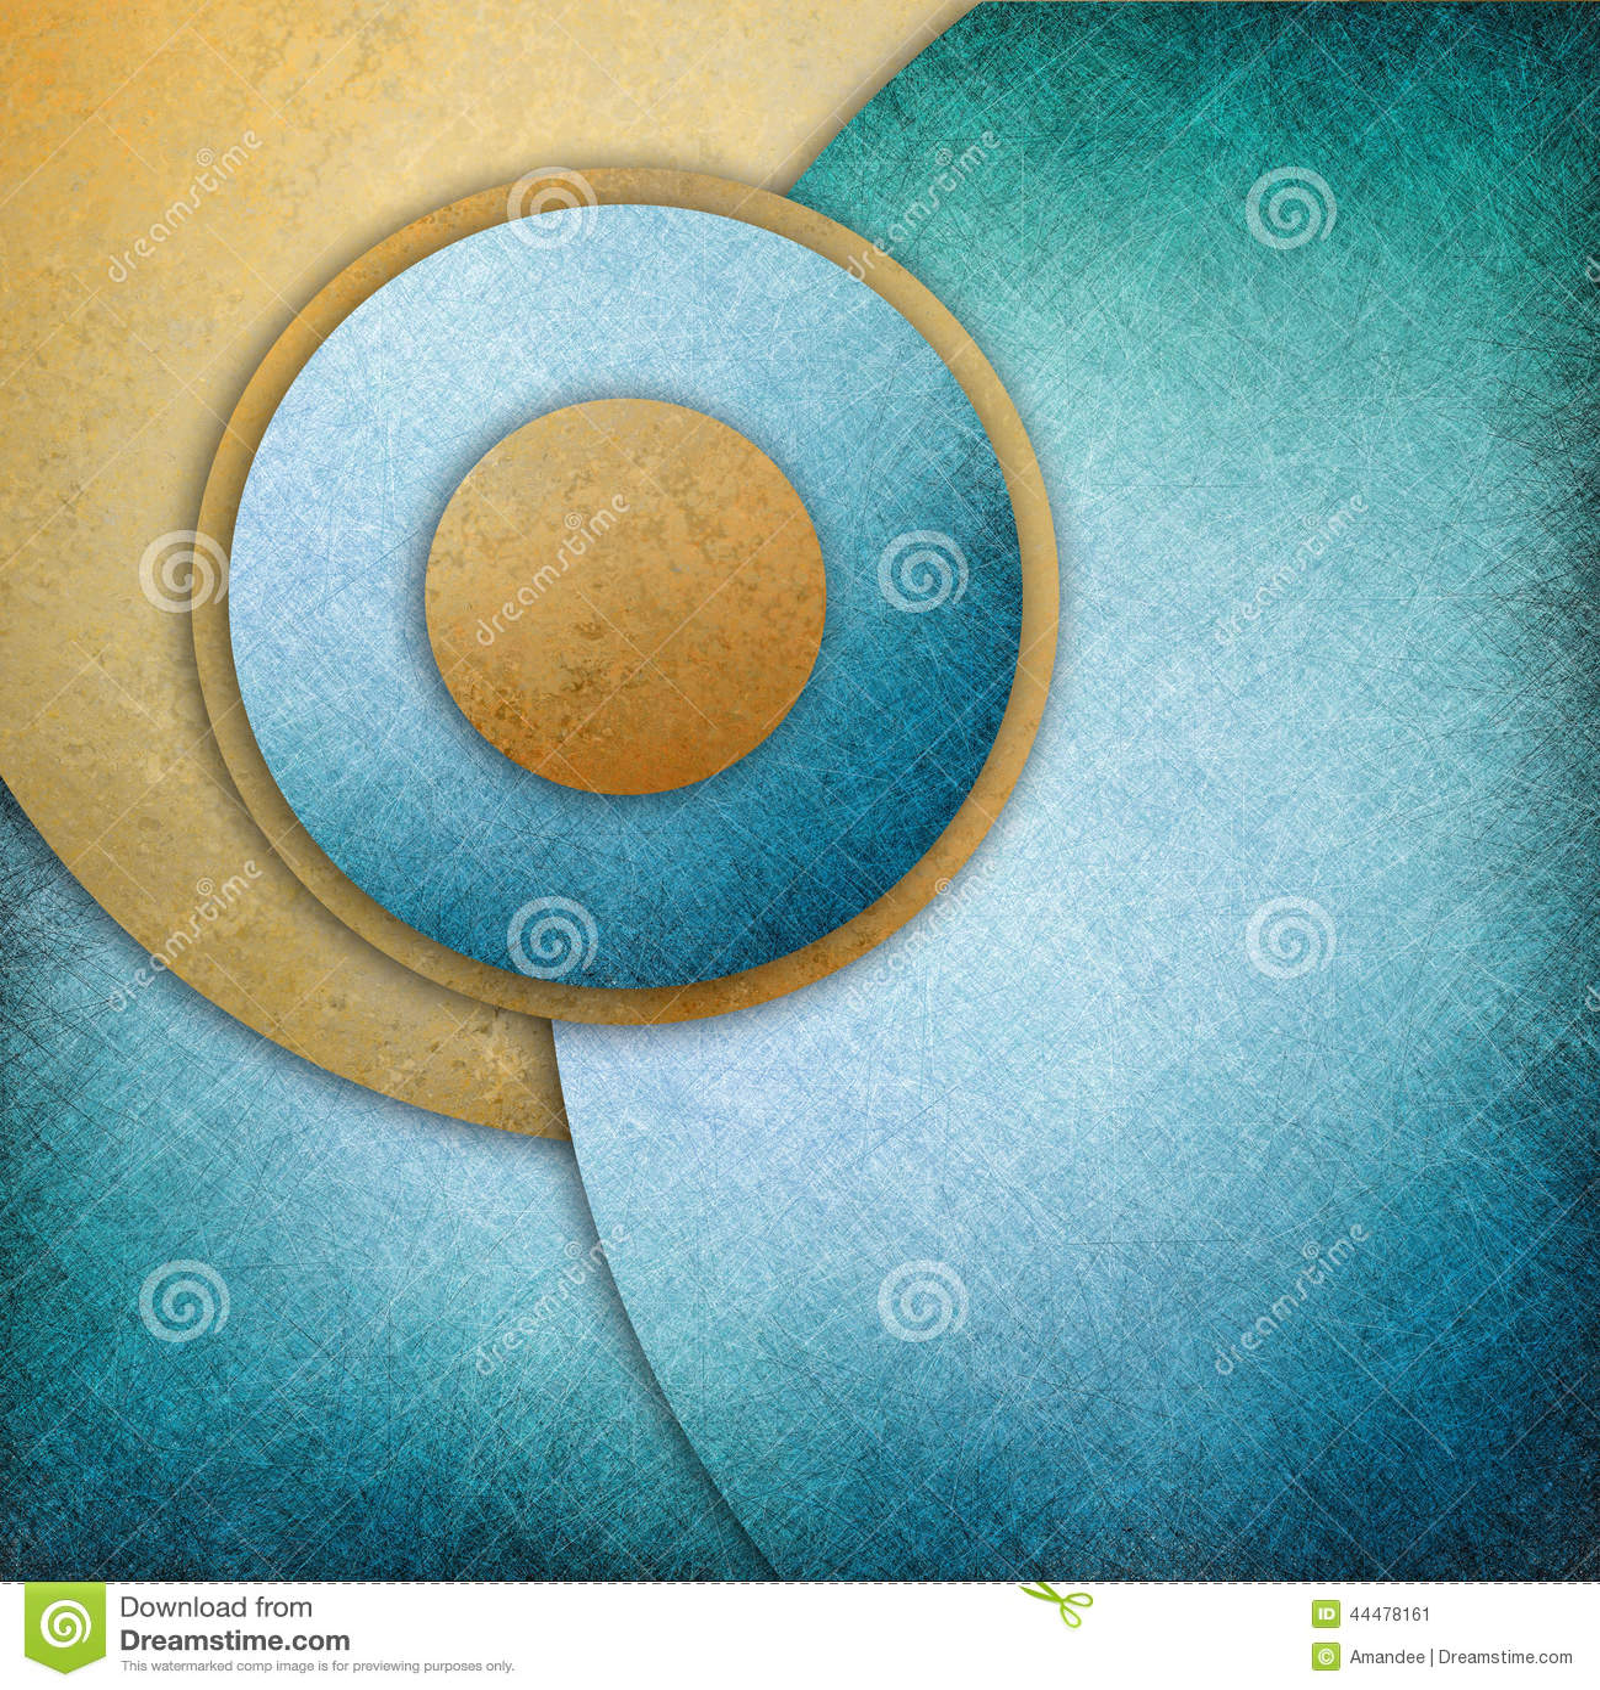 abstract design circle sector - photo #4